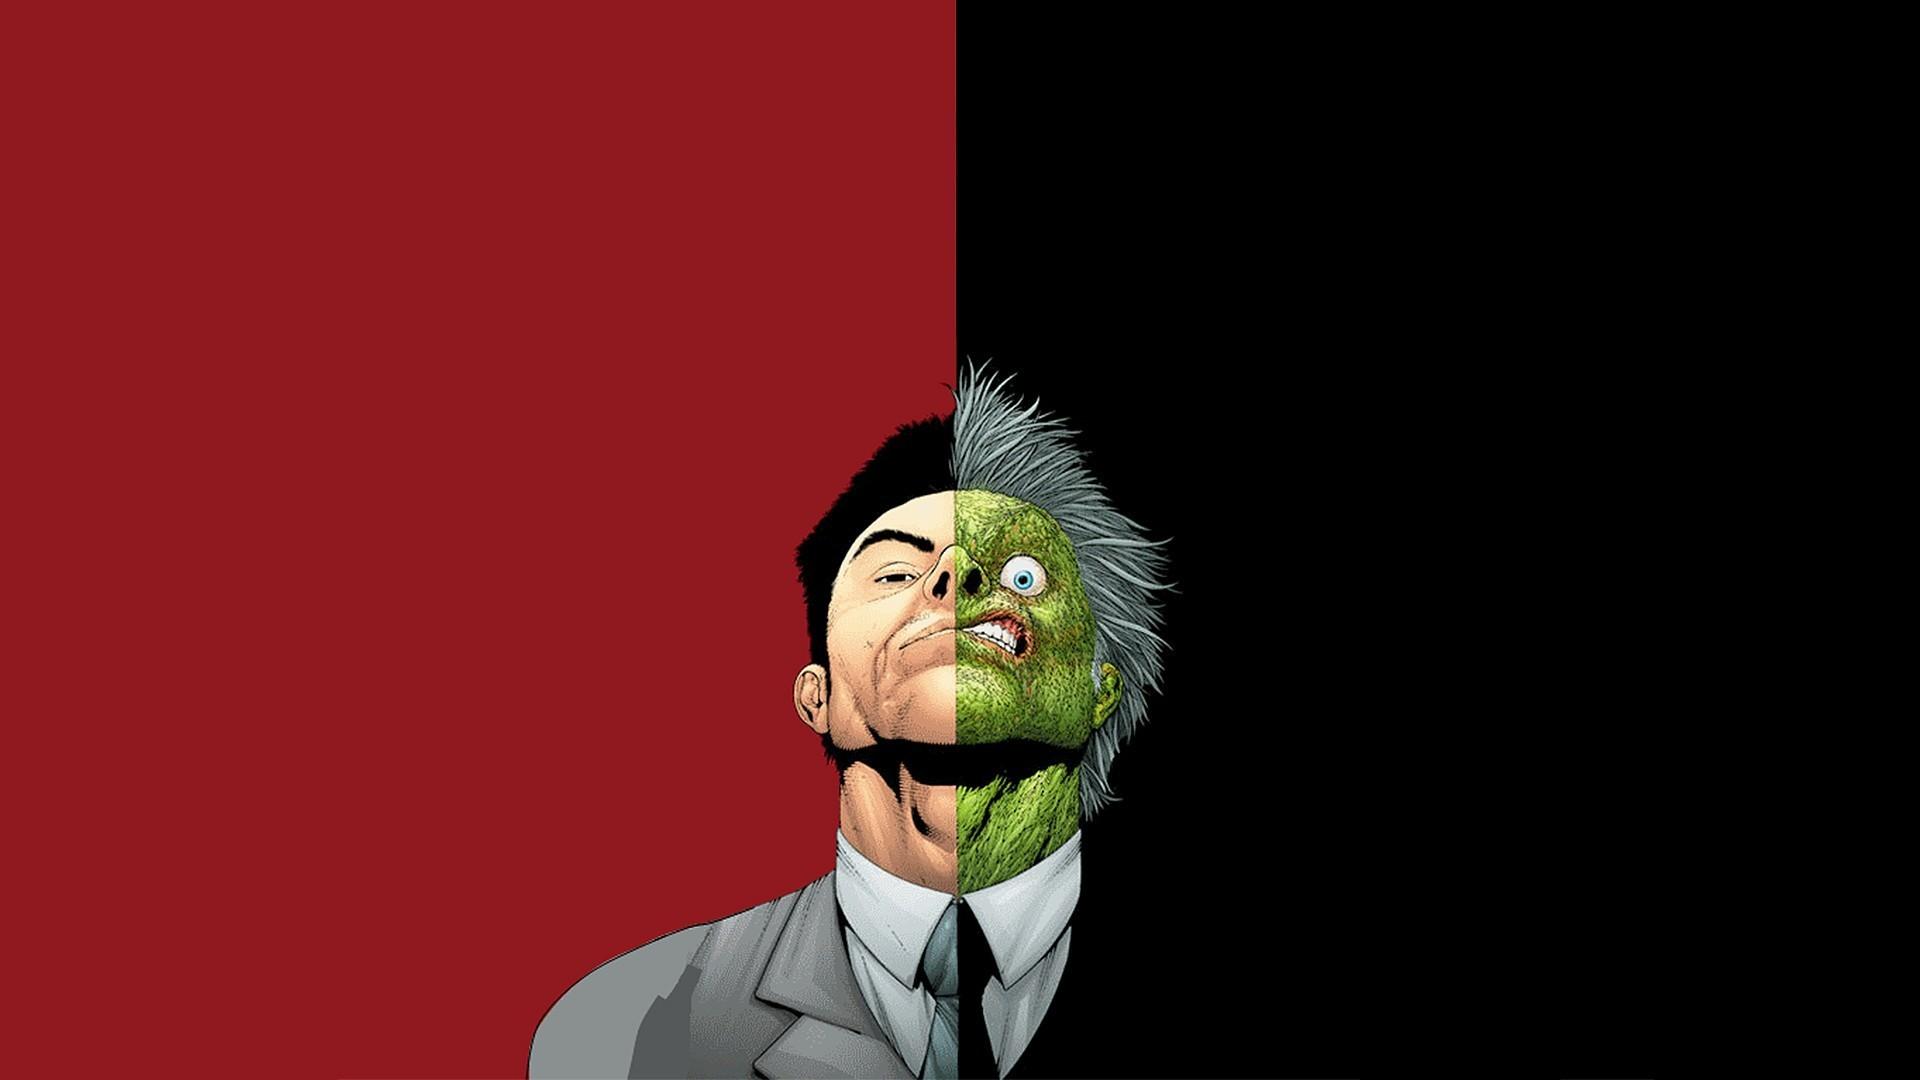 Two Faced Wallpaper.jpg